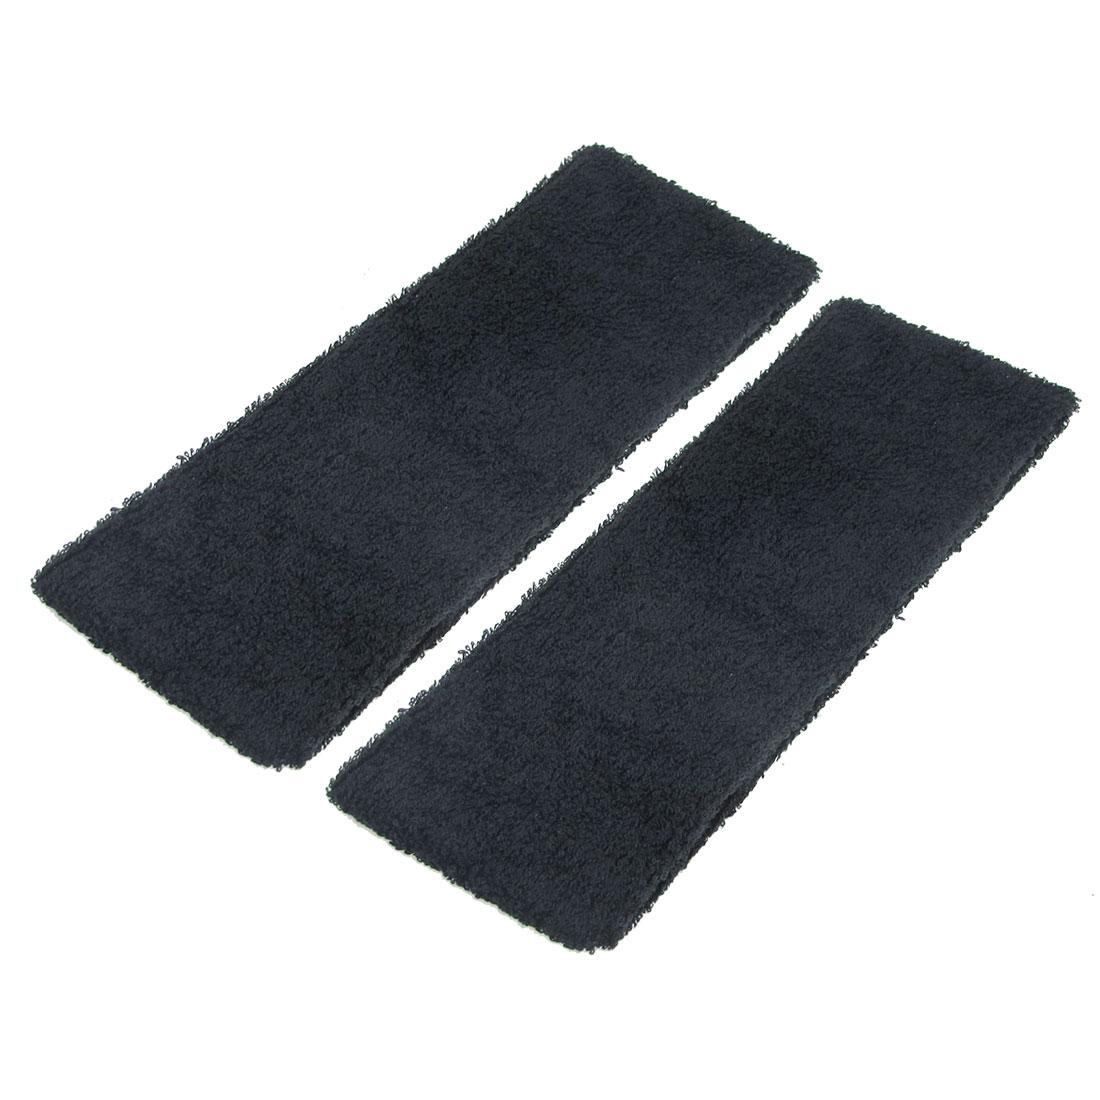 Terry Cloth Elastic Athletic Sport Hairband Headband Black 7cm Wide 2 Pcs